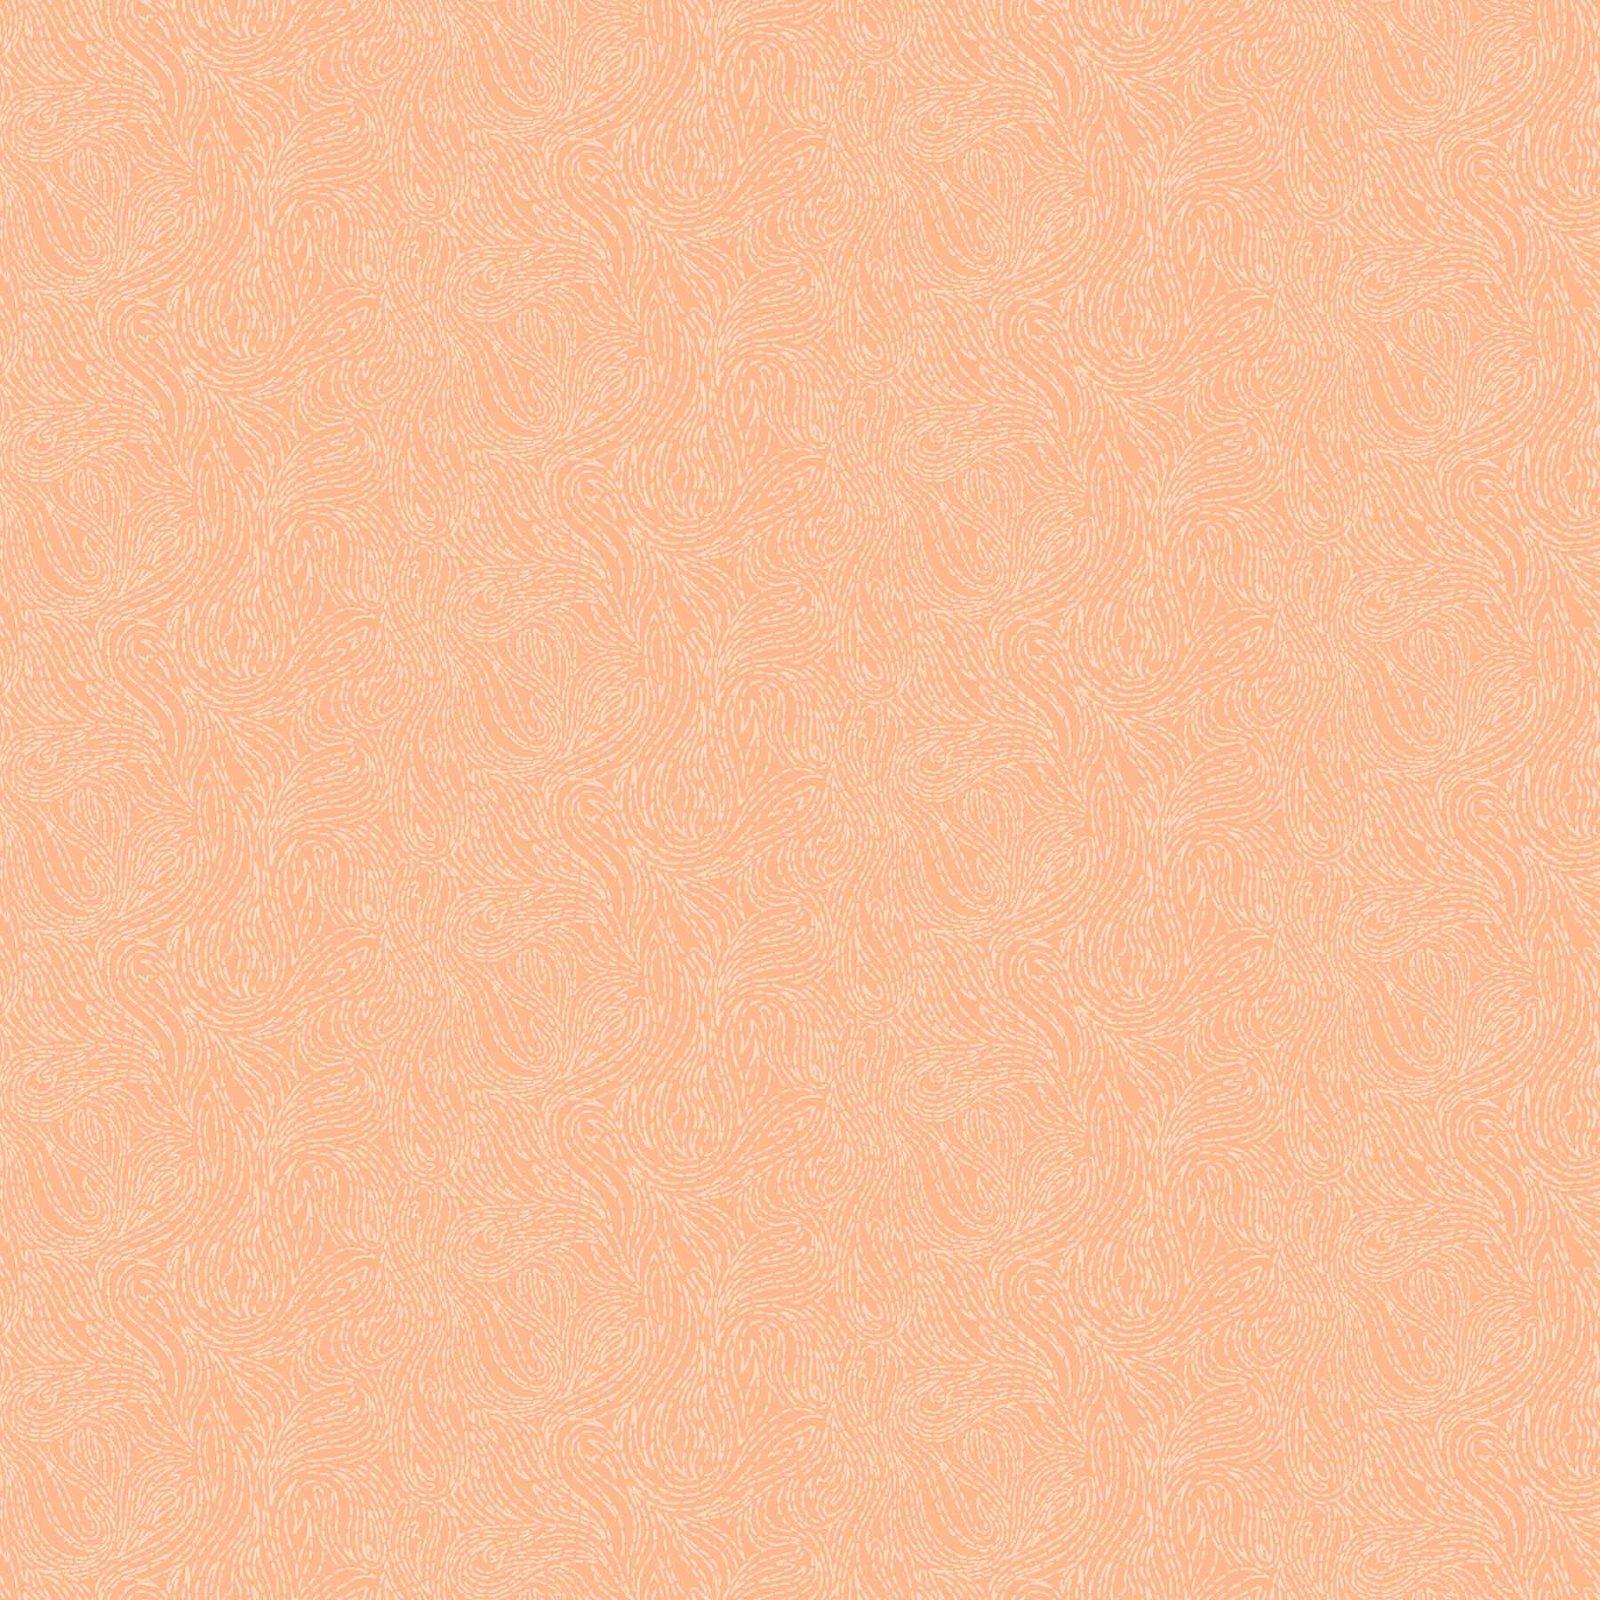 Figo Elements - Whorls Coral